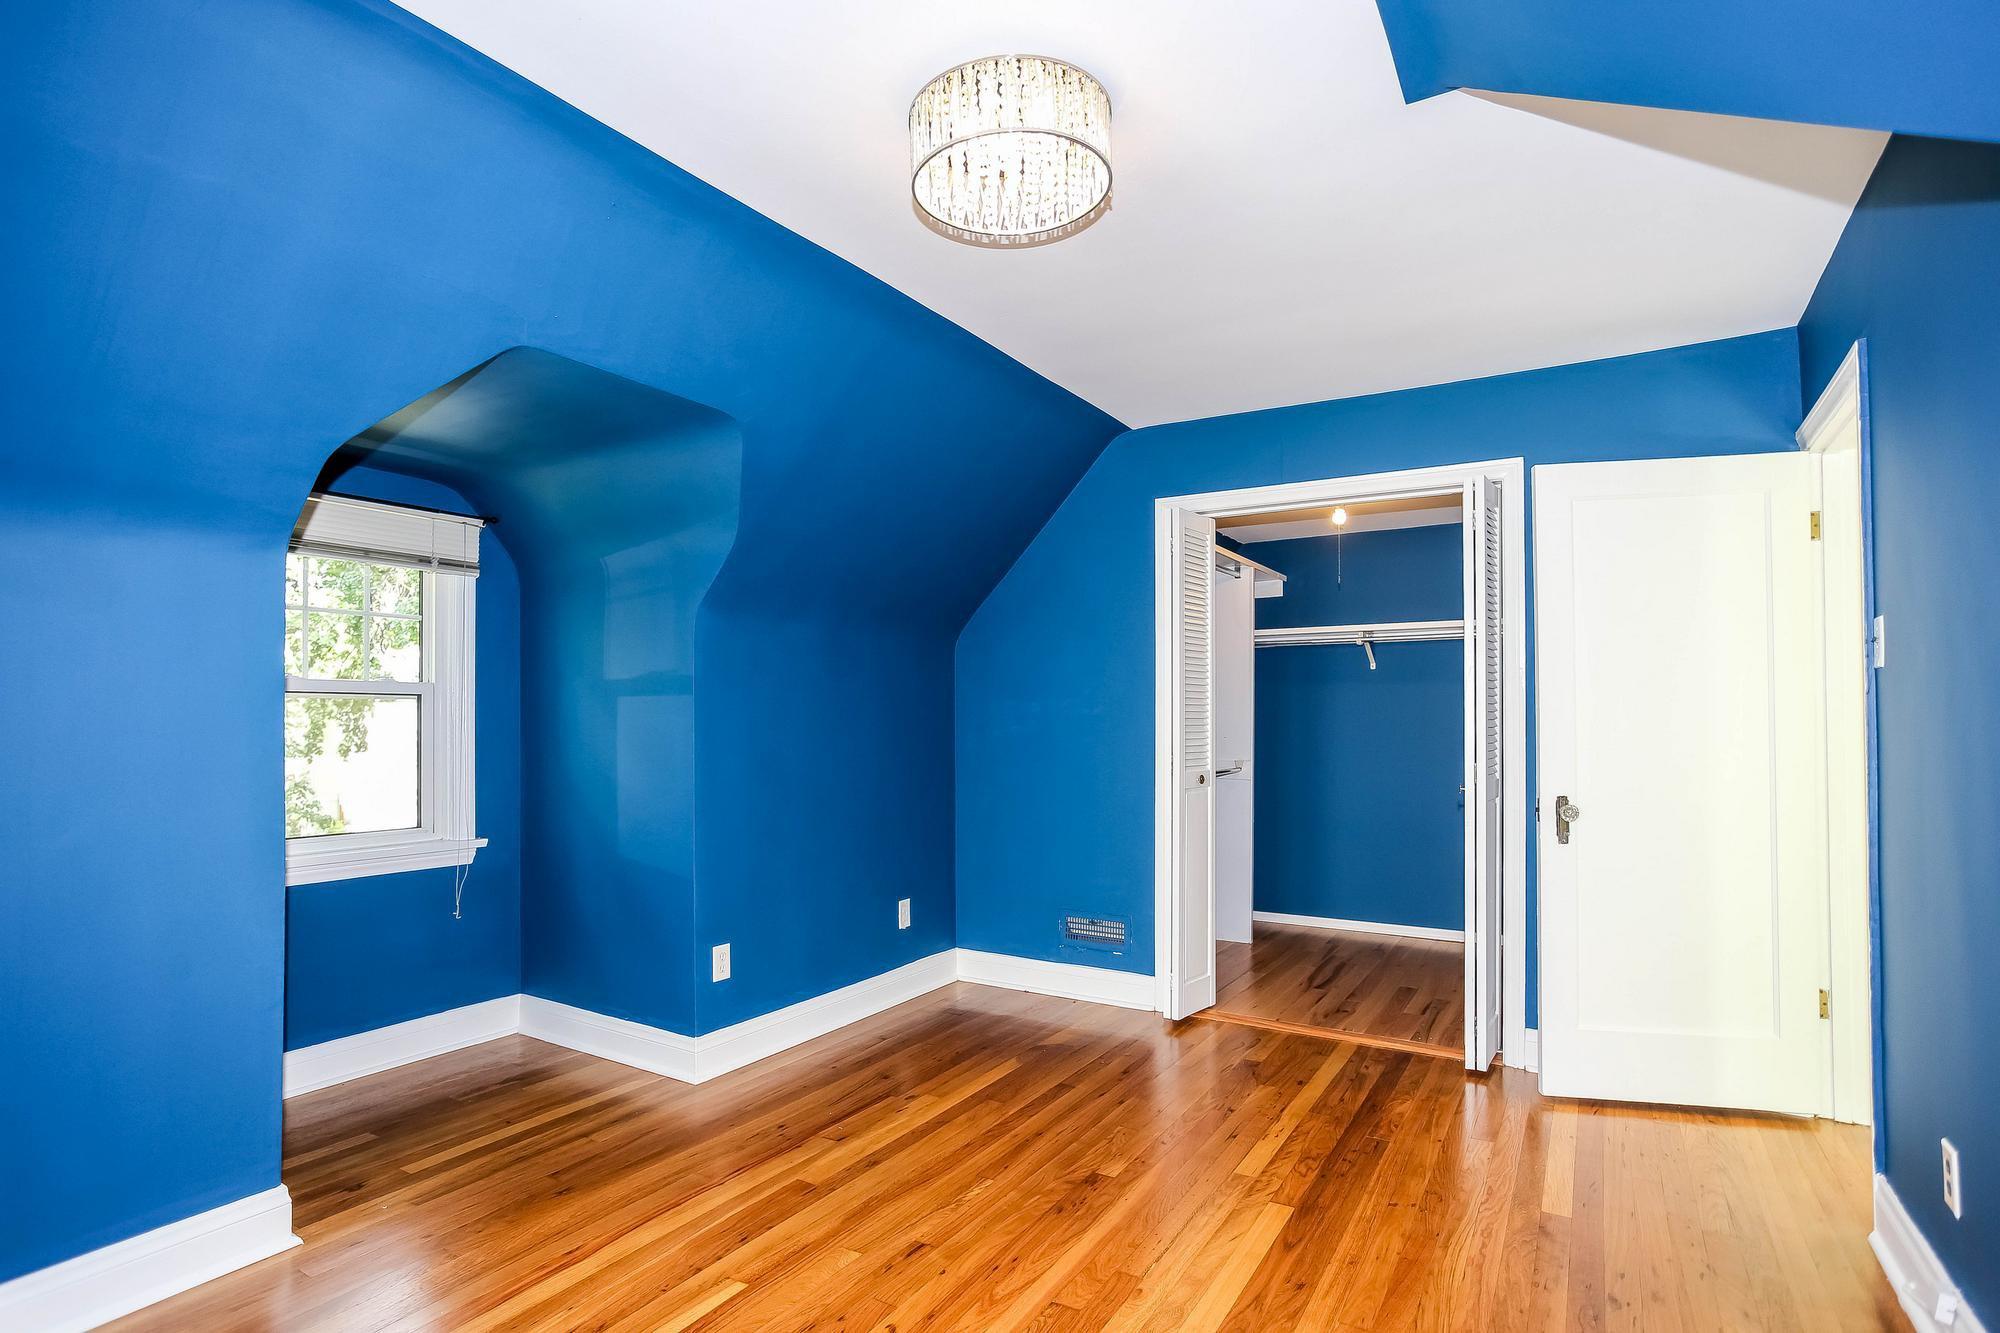 Photo 22: Photos: 155 Borebank Street in Winnipeg: River Heights Single Family Detached for sale (1C)  : MLS®# 202017166